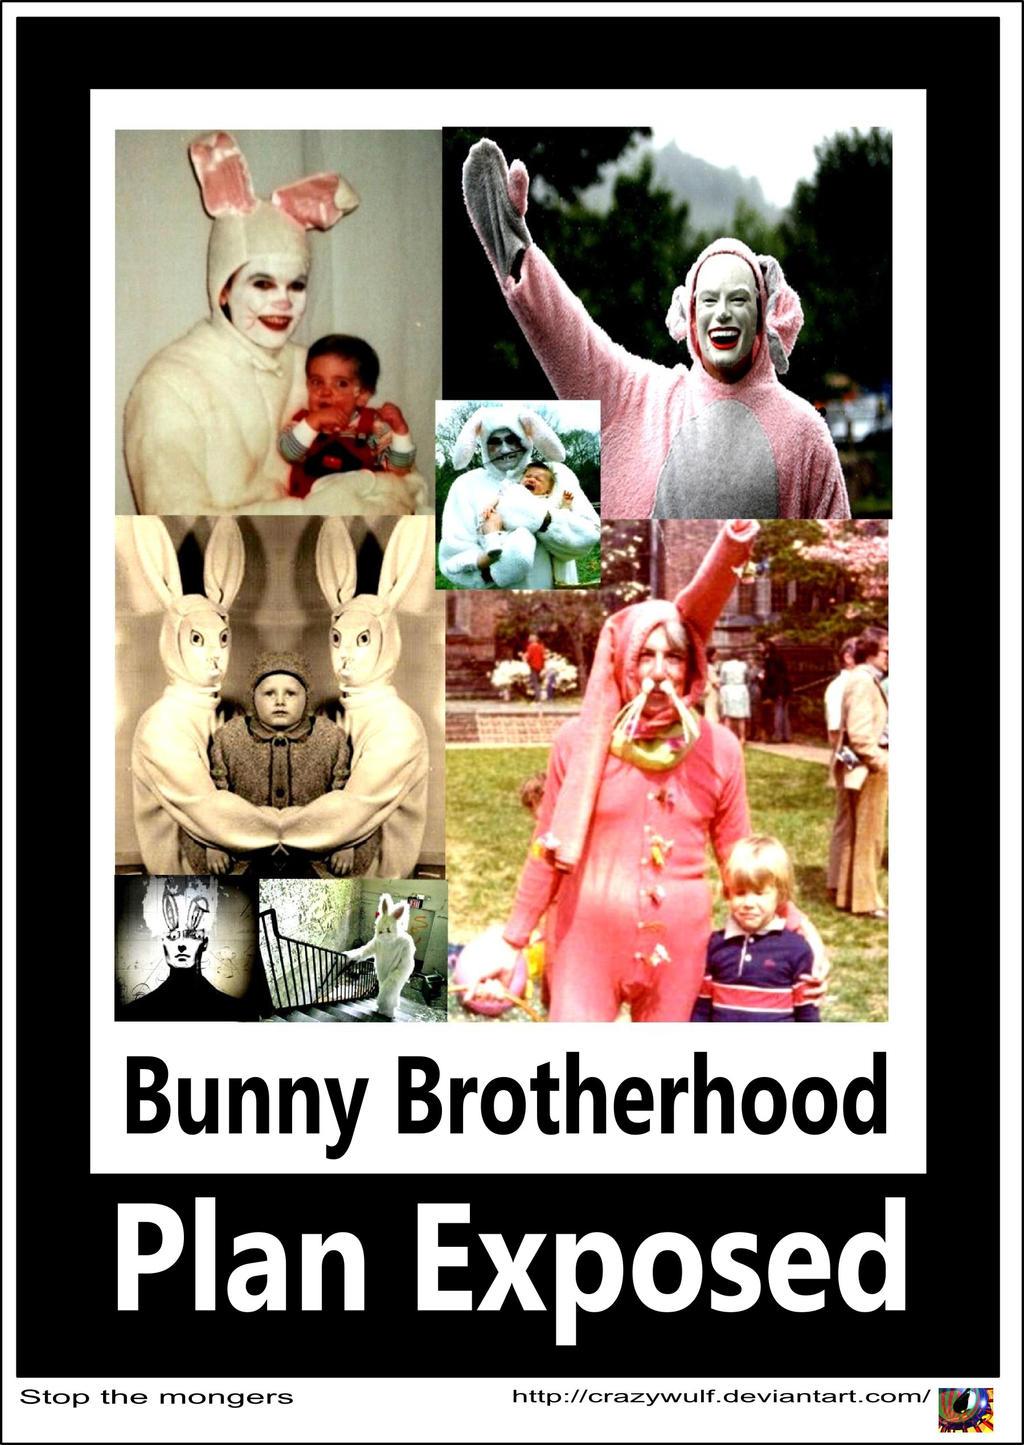 Bun Bun Brotherhood by Crazywulf